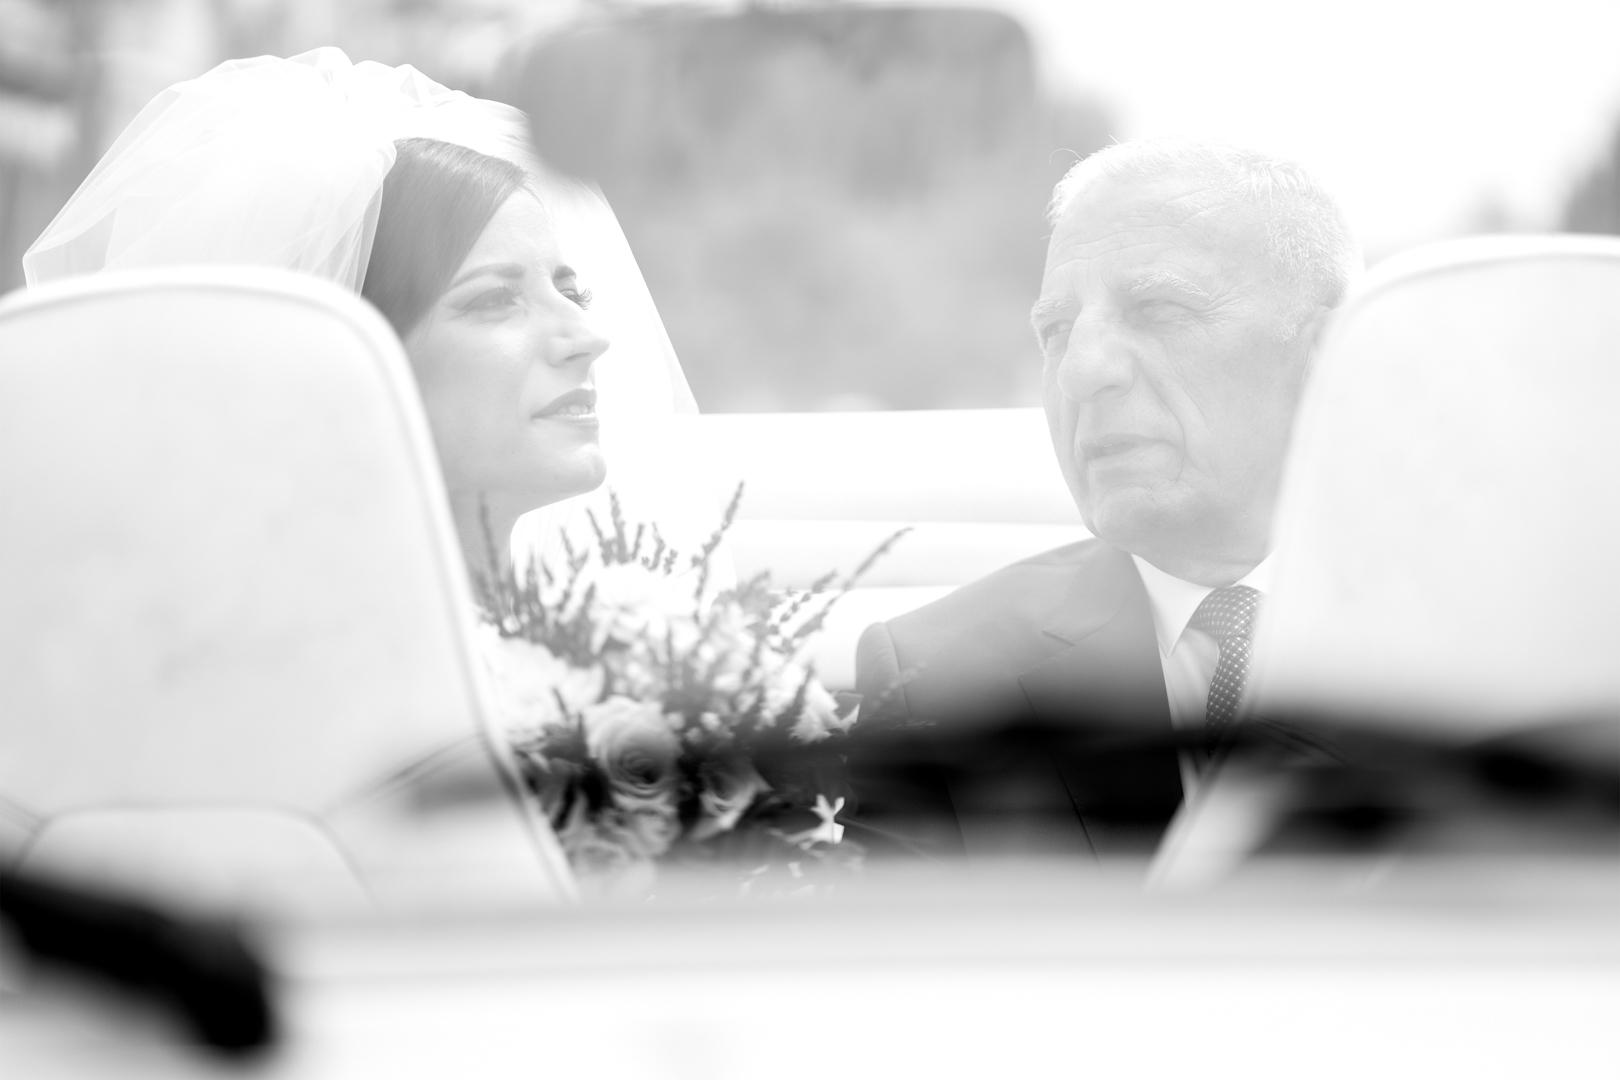 25 gianni-lepore-sposa-papà-macchina